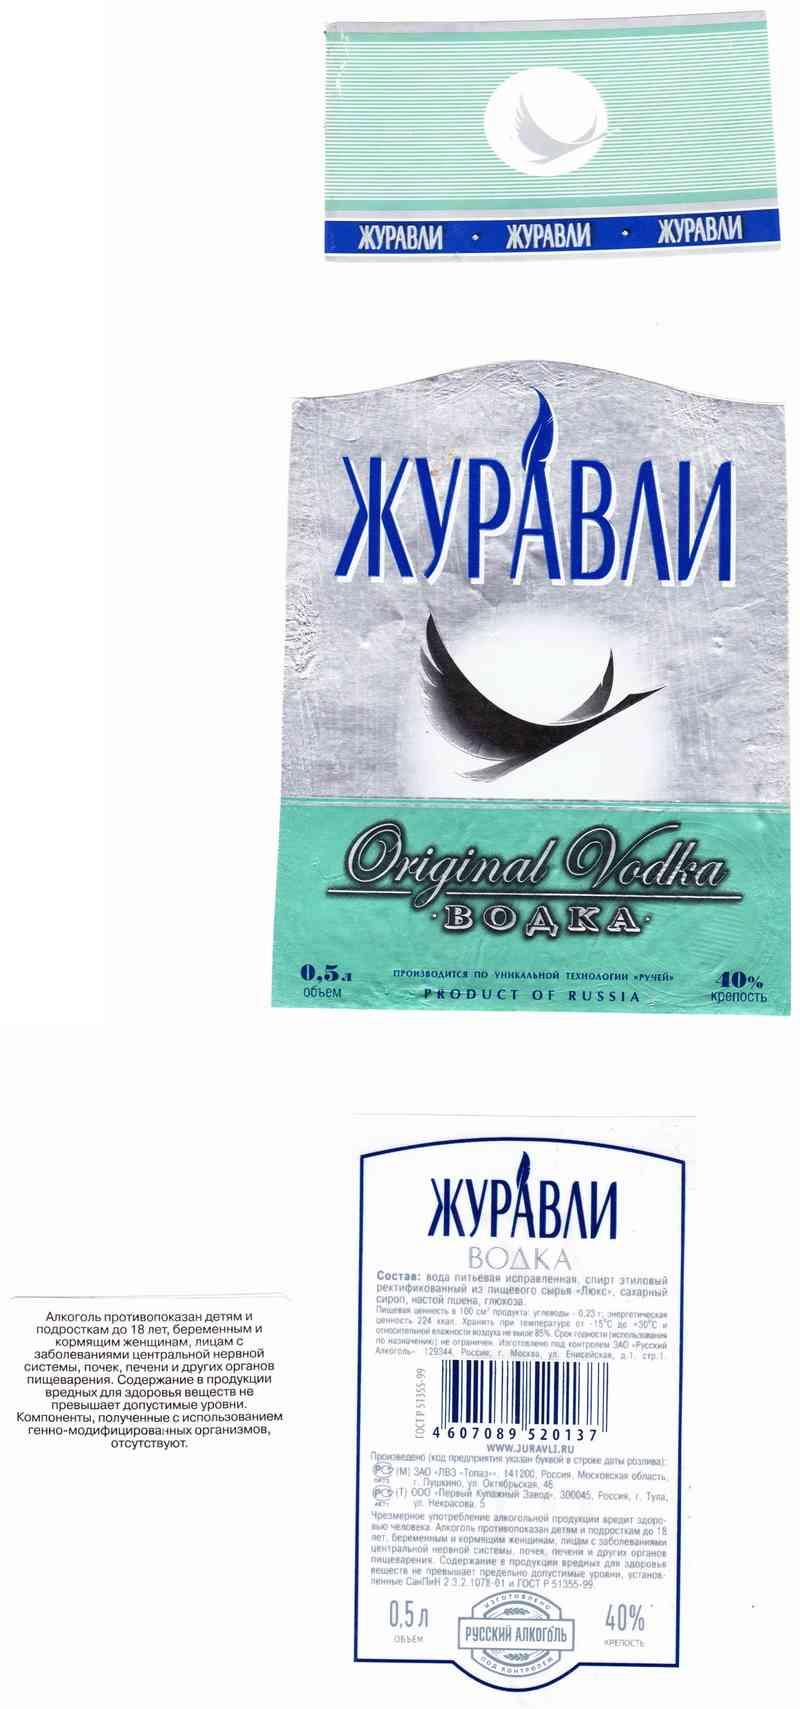 Белая берёза – водка, взятая под защиту